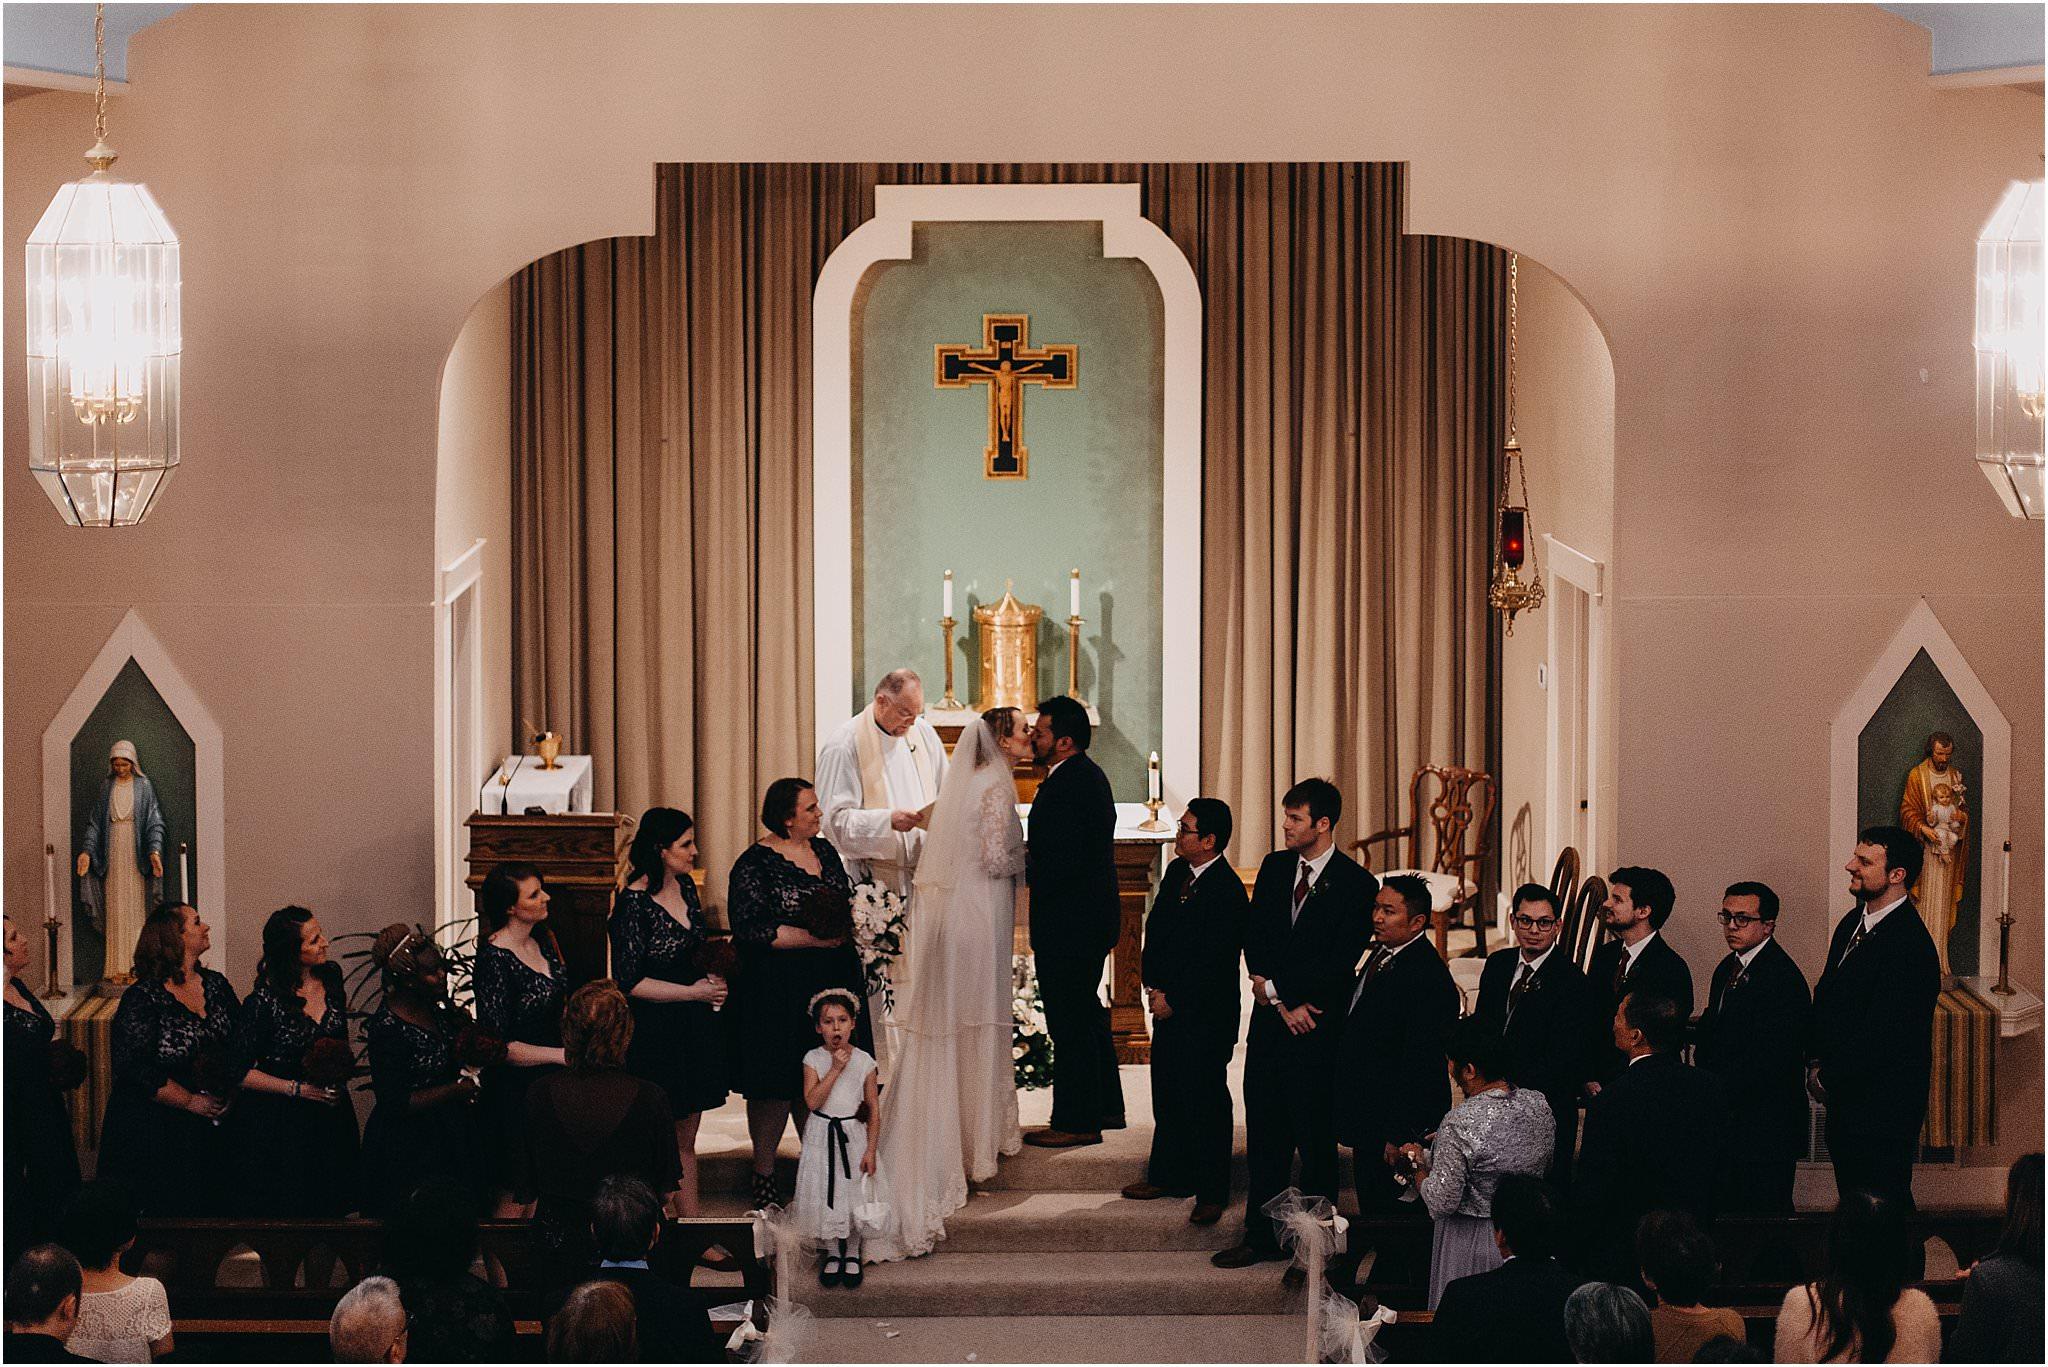 katy-robin-married-in-mukilteo-wedding34.jpg